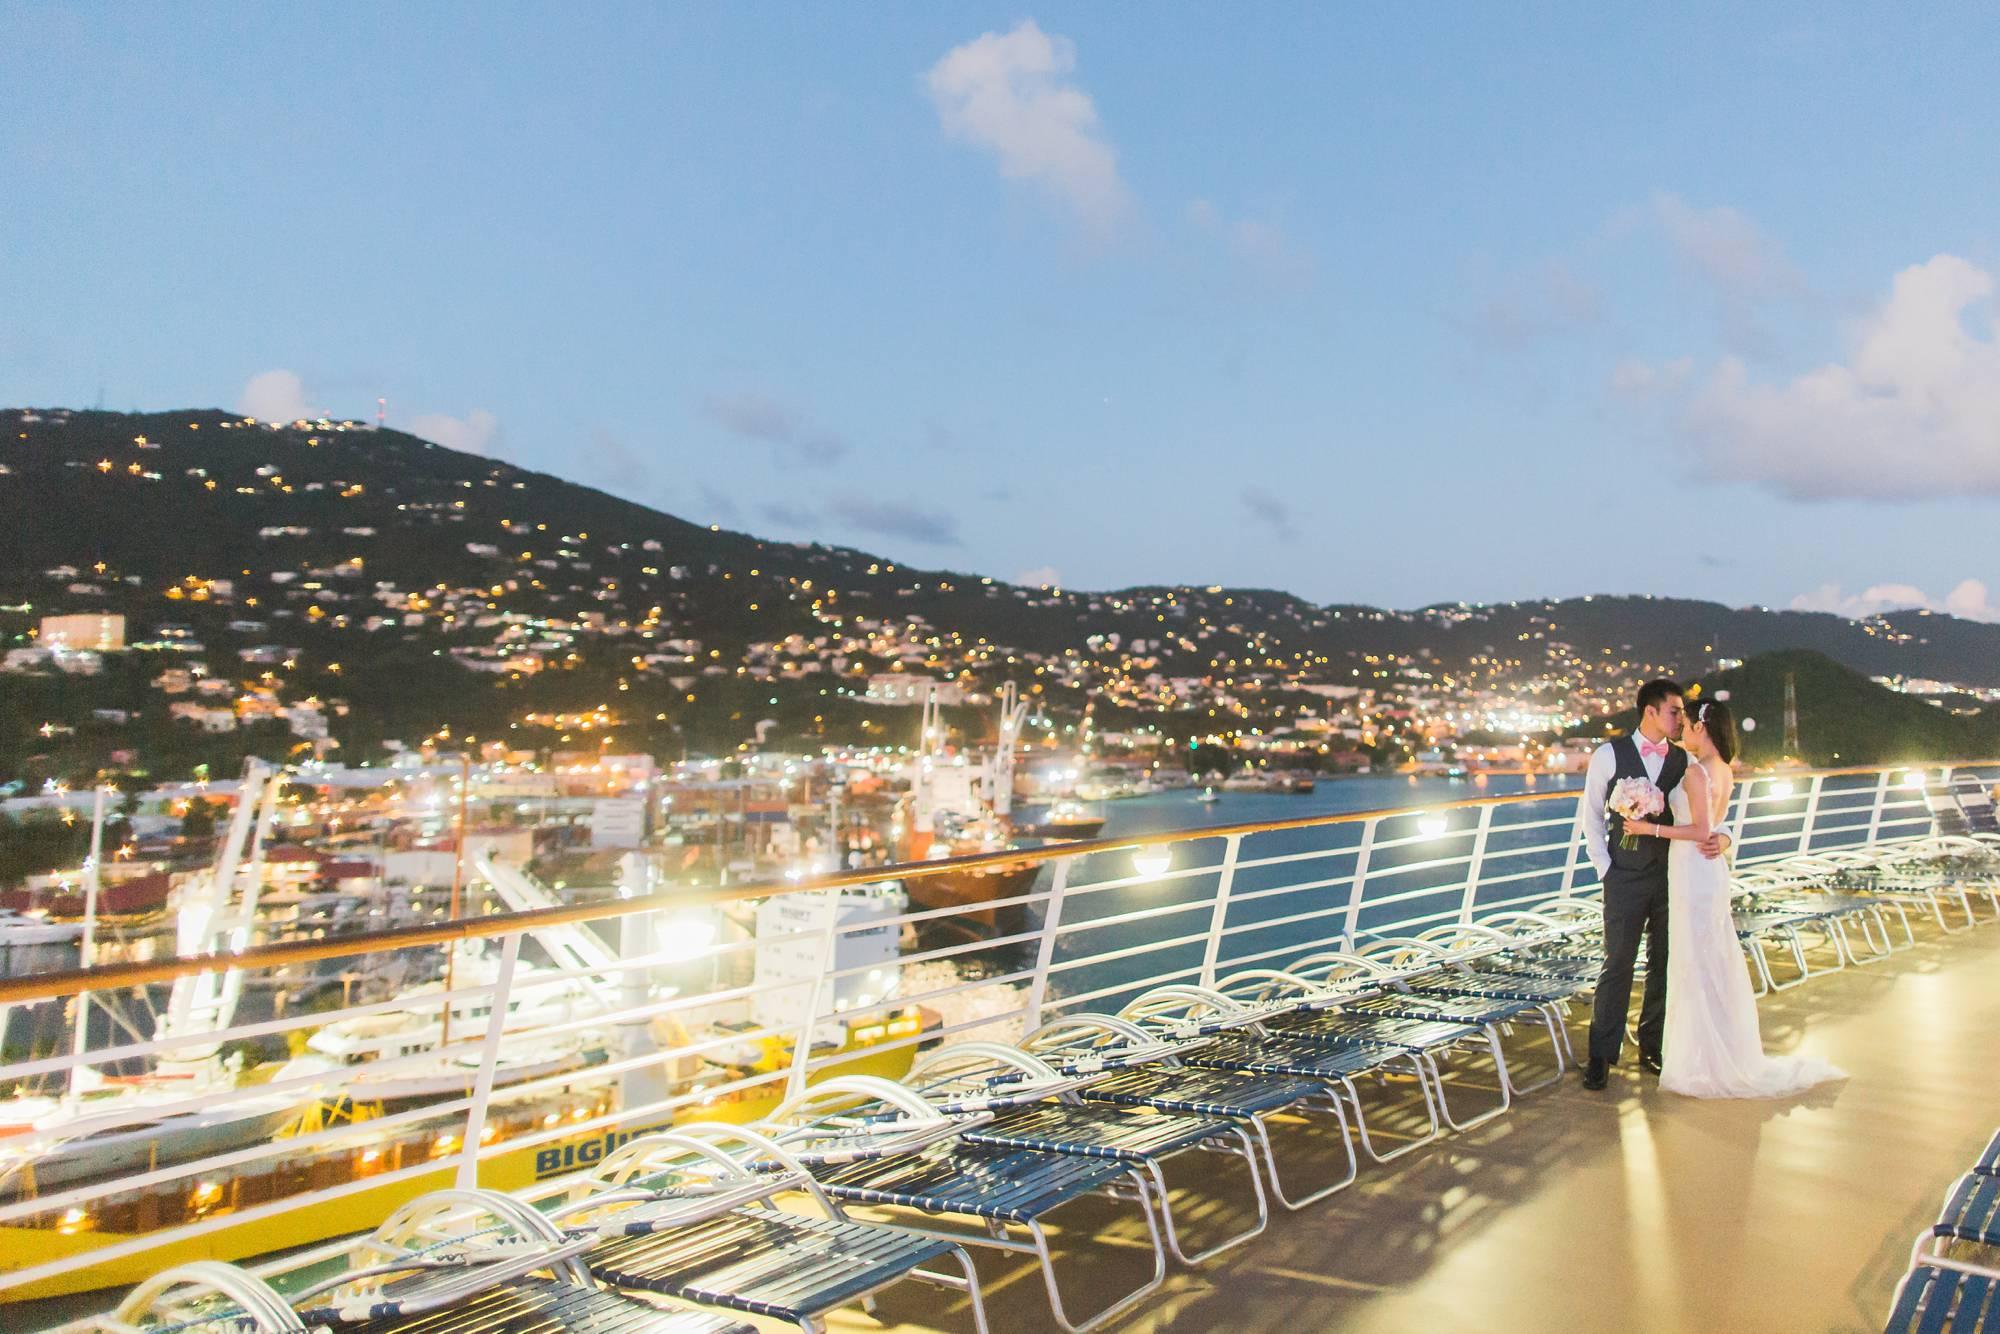 Royal_Caribbean_Allure_of_The_Seas_St_Thomas_Wedding_Photos_Toronto_Destination_Wedding_Photographer